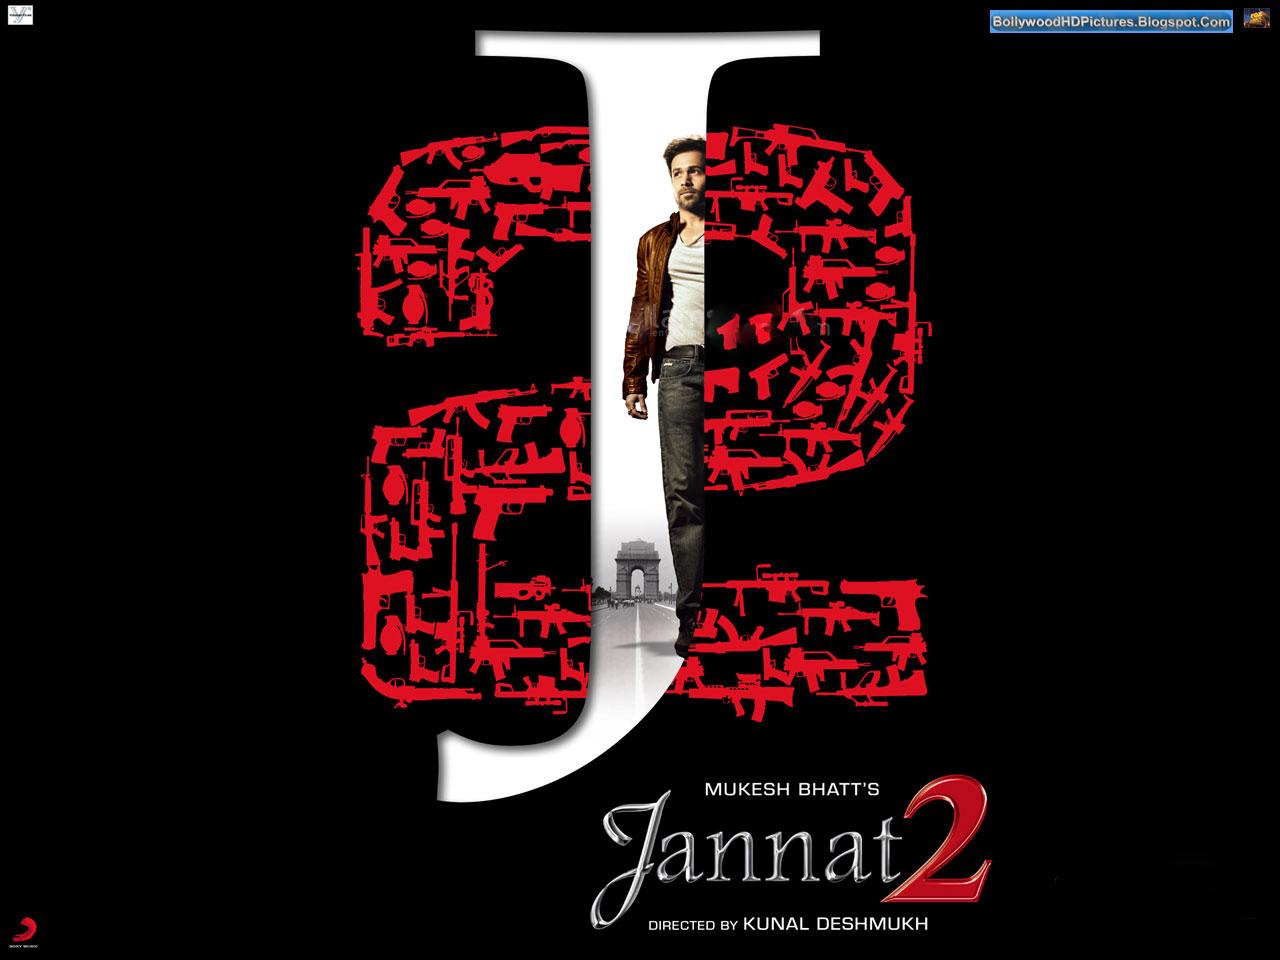 http://4.bp.blogspot.com/-J7BRyuDyMhw/T4q08mvHMPI/AAAAAAAAElw/F0pY5kvlNL0/s1600/Jannat+2+Wallpapers+HD+by+Bollywoodhdpictures.blogspot+%25282%2529.jpg